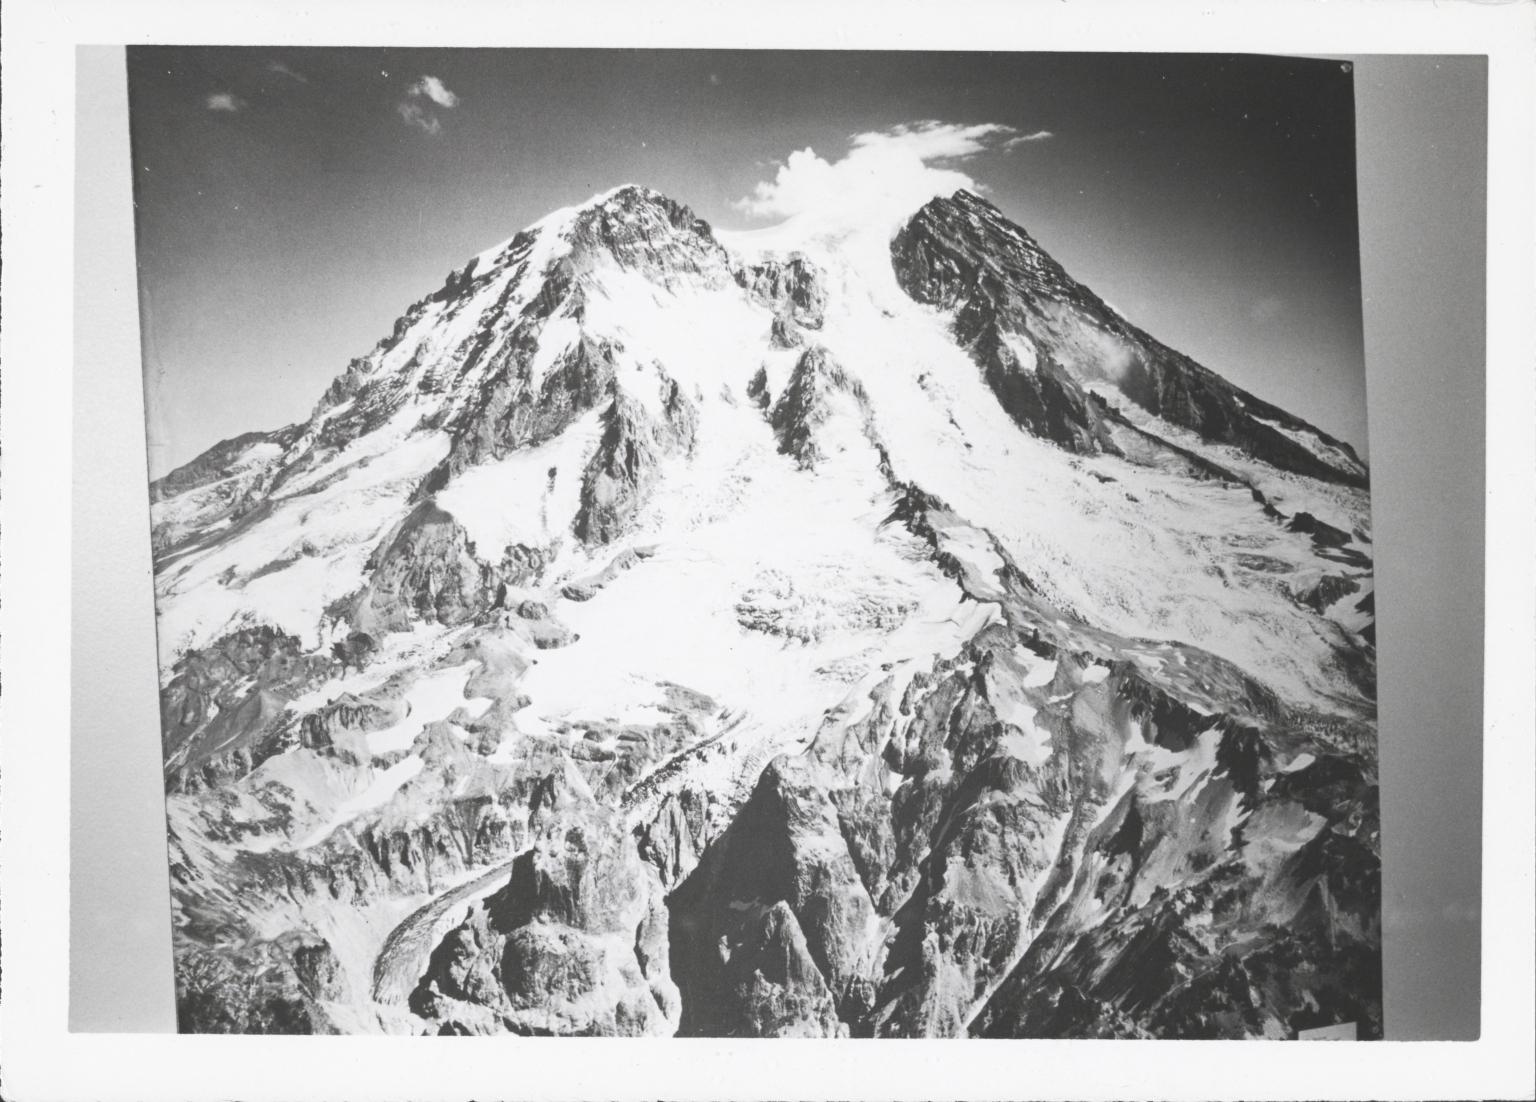 Puyallup Glacier, Washington